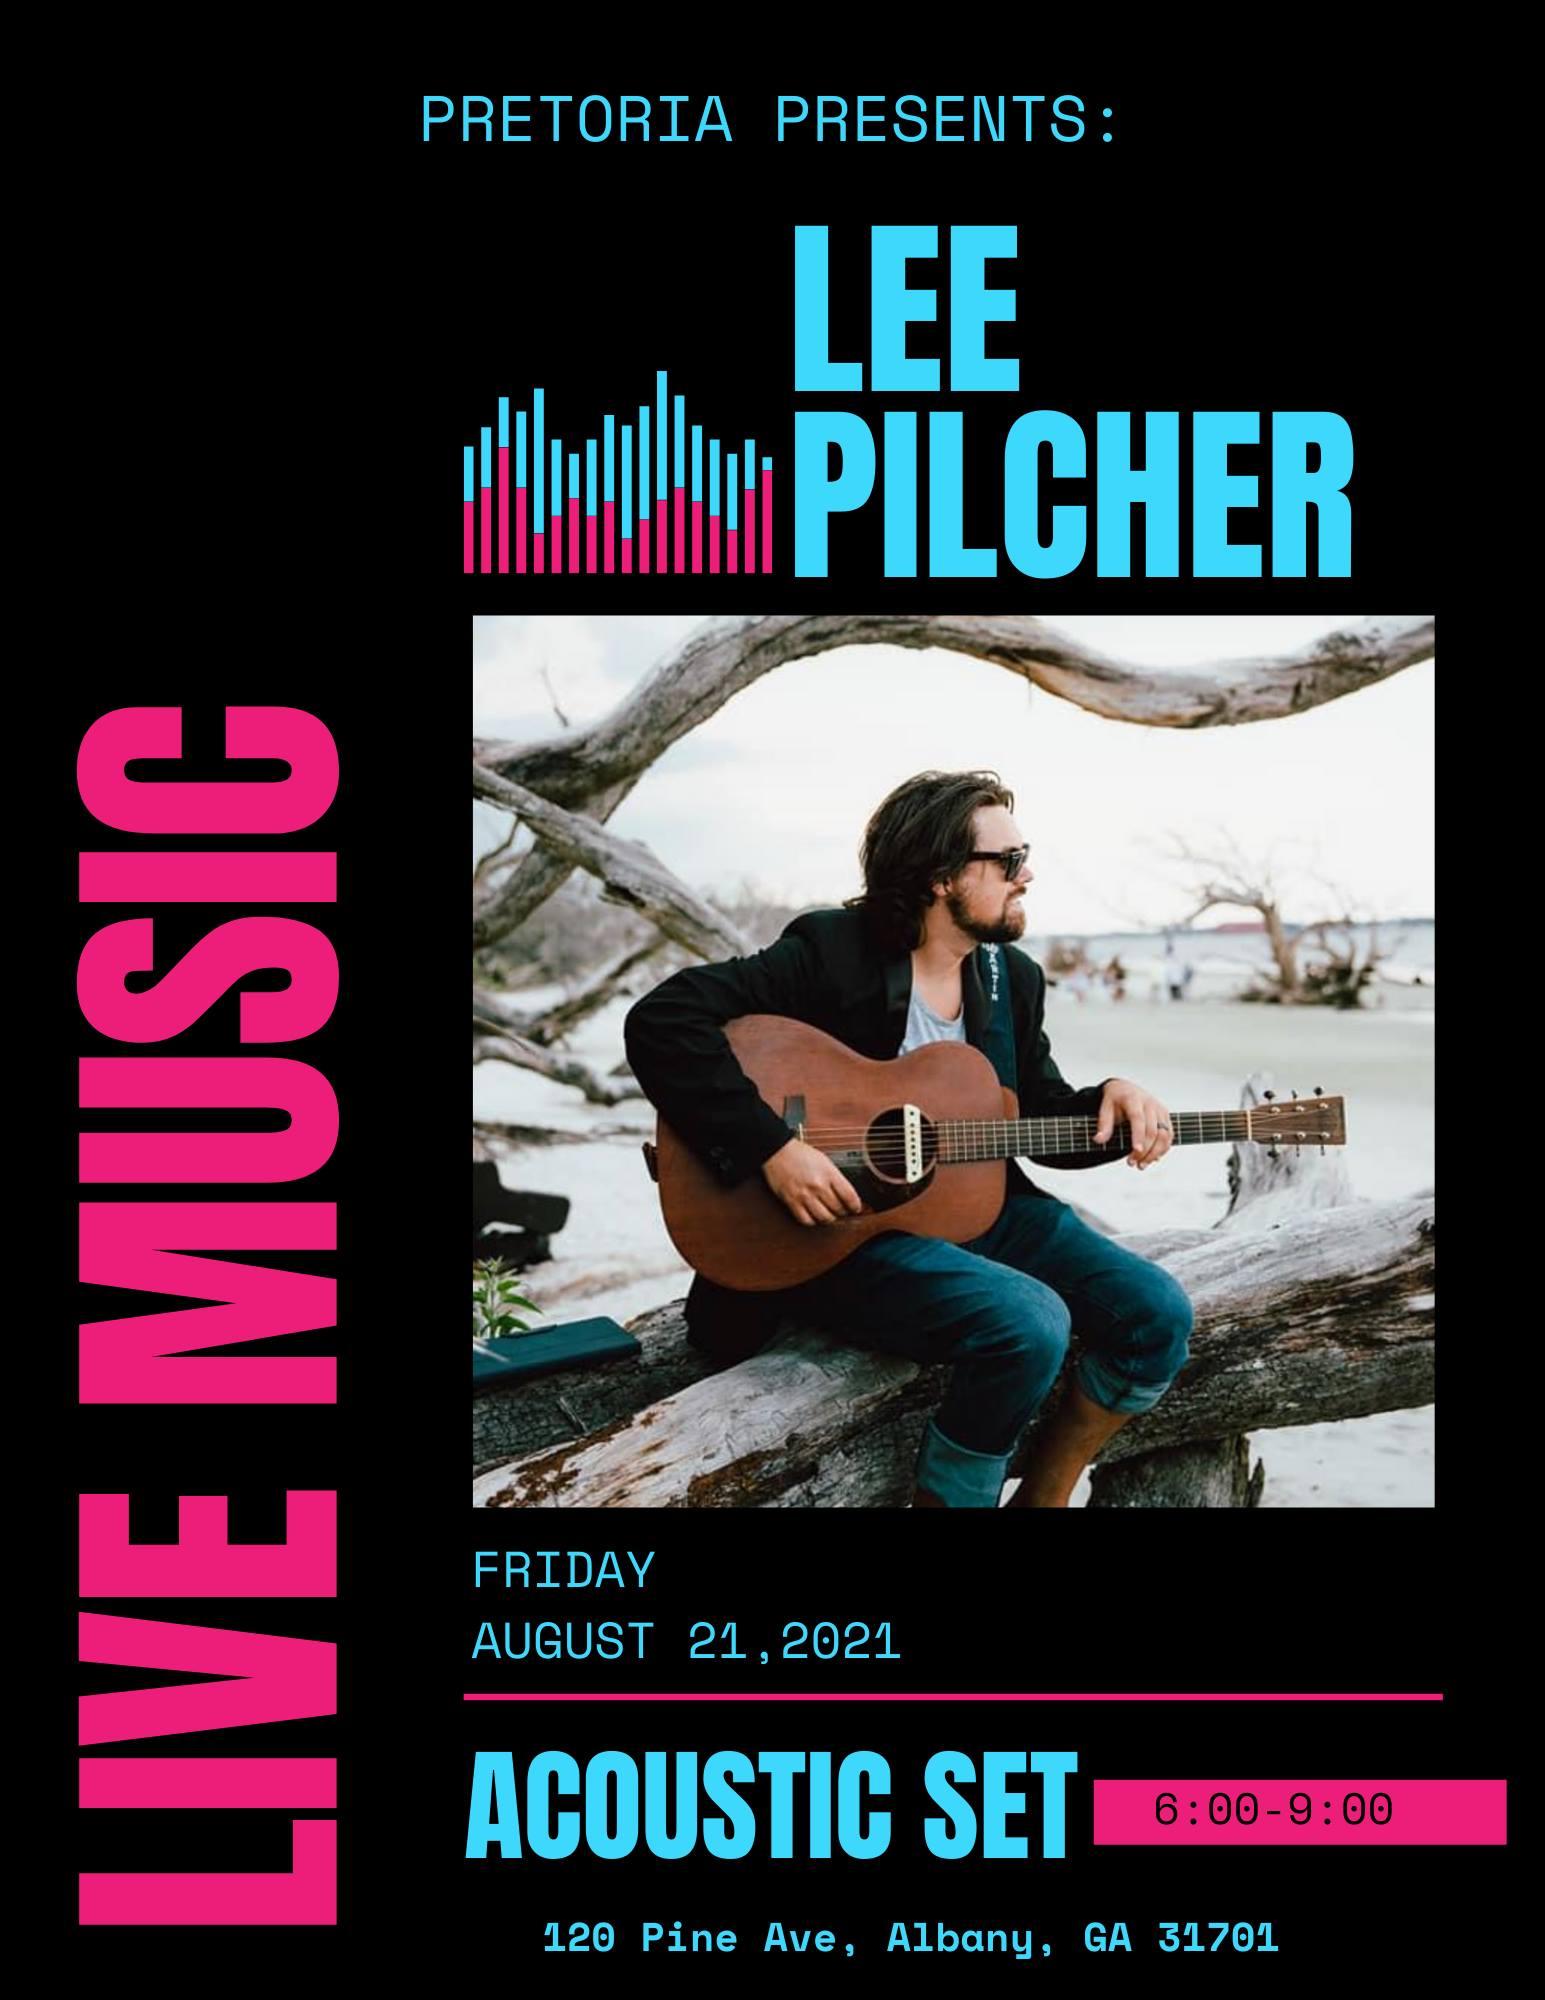 Pretoria Fields Live Music: Lee Pilcher